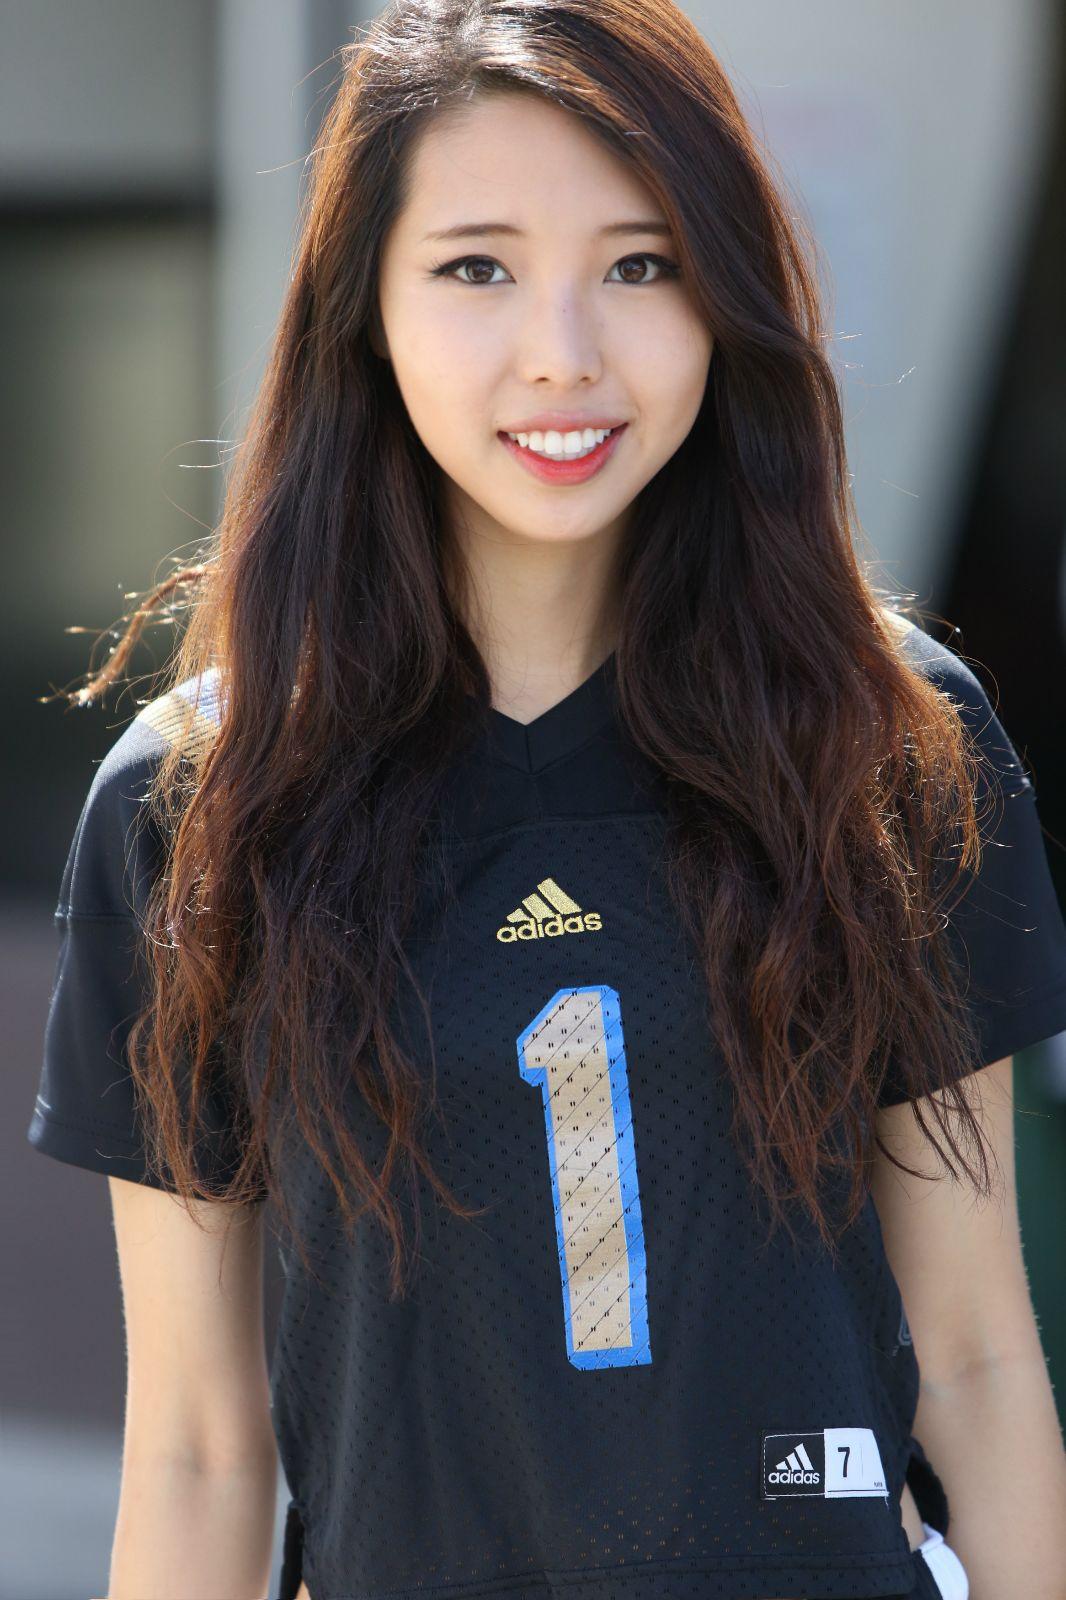 American asian girl